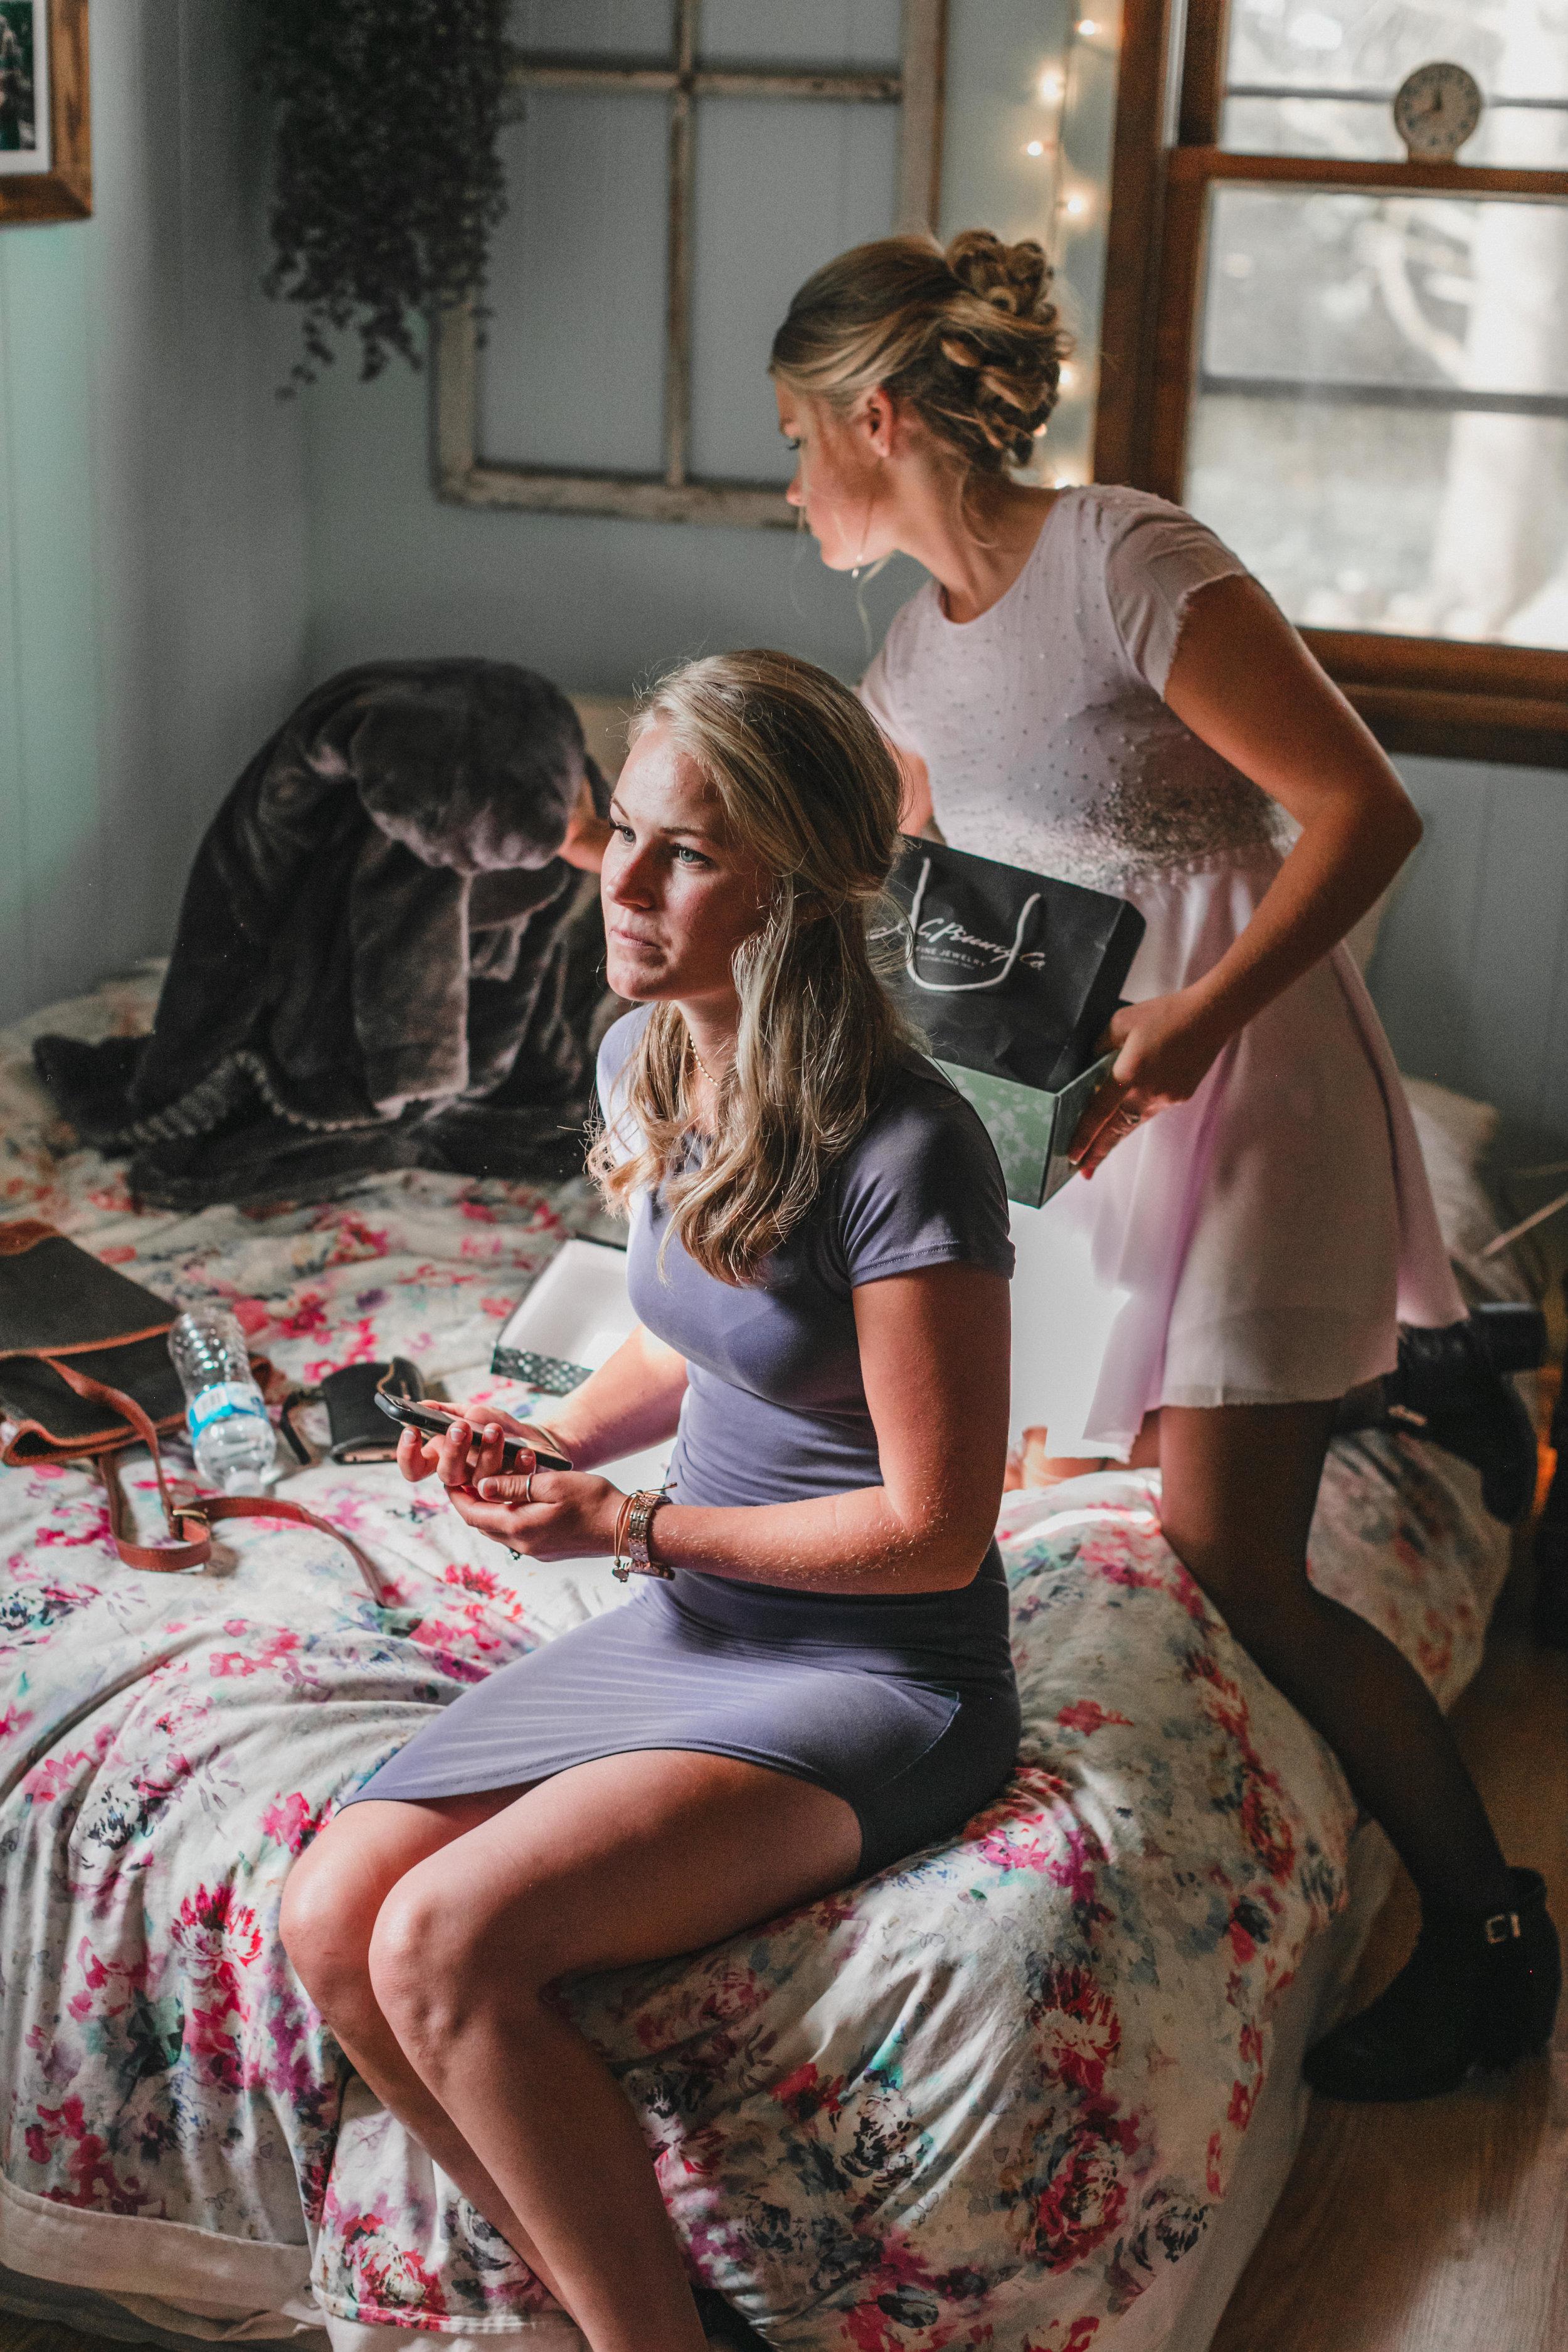 vild-photography-photographer-tahoe-intimate-wedding-adventure-van-abigail-246.jpg